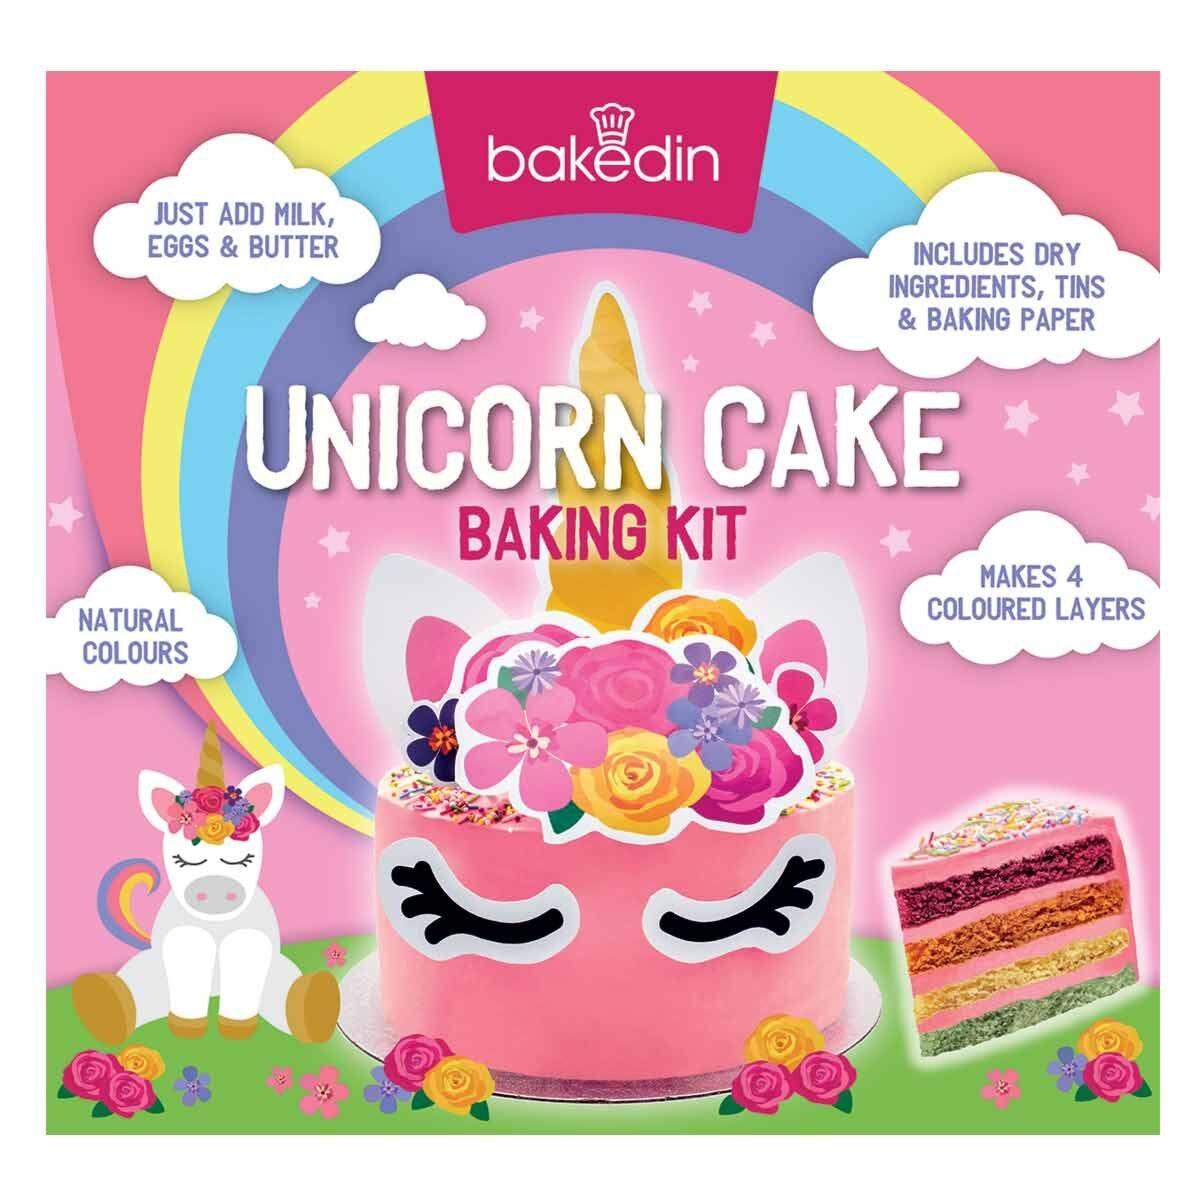 Bakedin Unicorn Cake Baking Kit